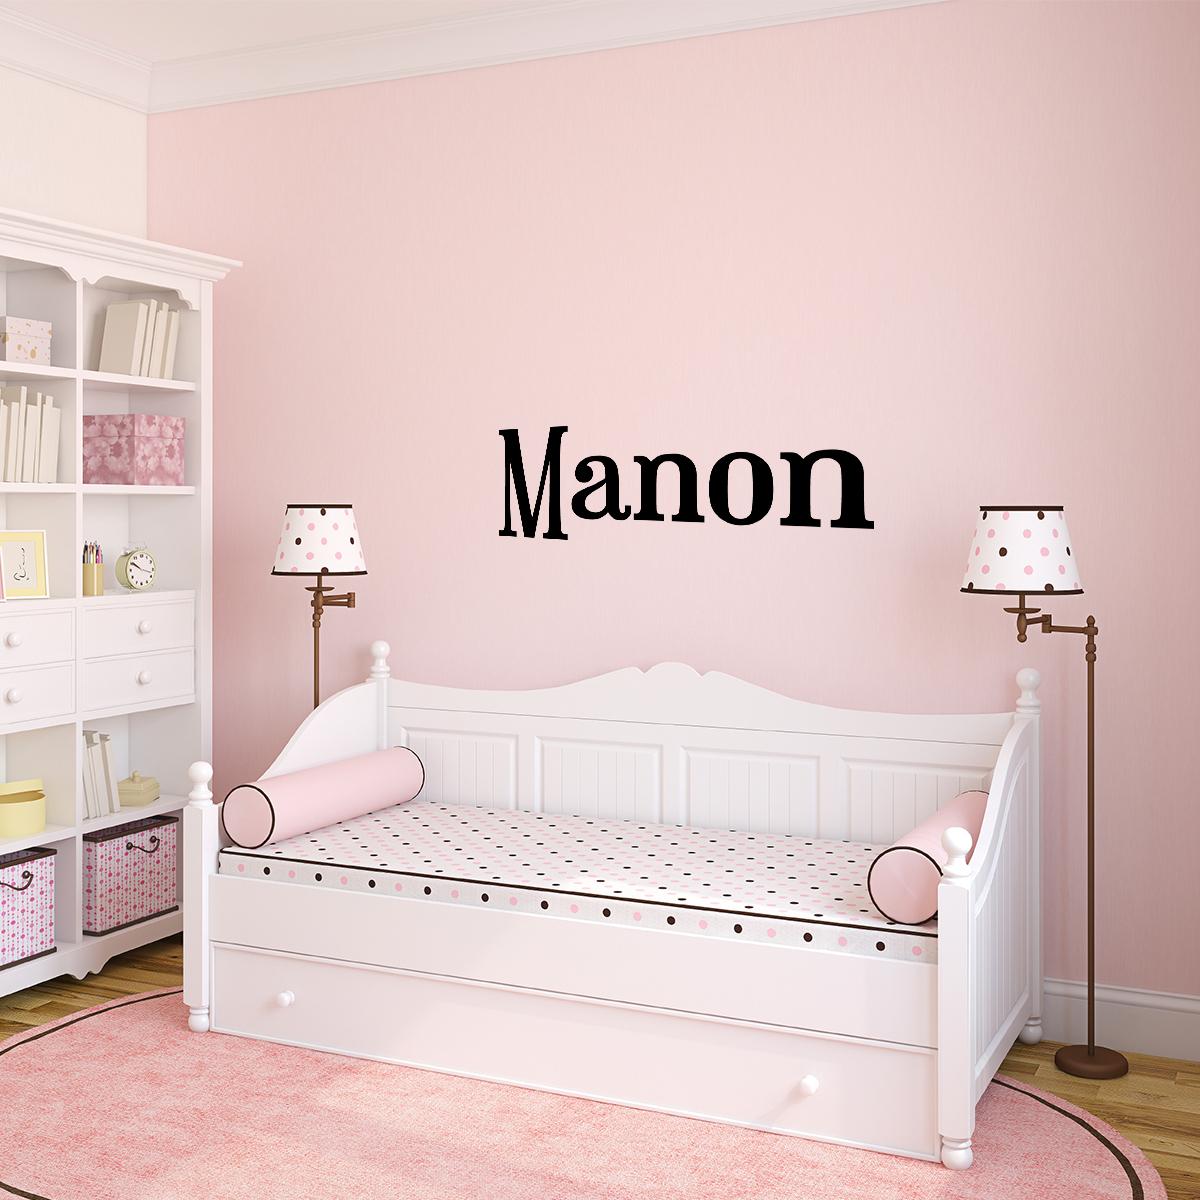 sticker pr nom personnalisable classique agr able. Black Bedroom Furniture Sets. Home Design Ideas